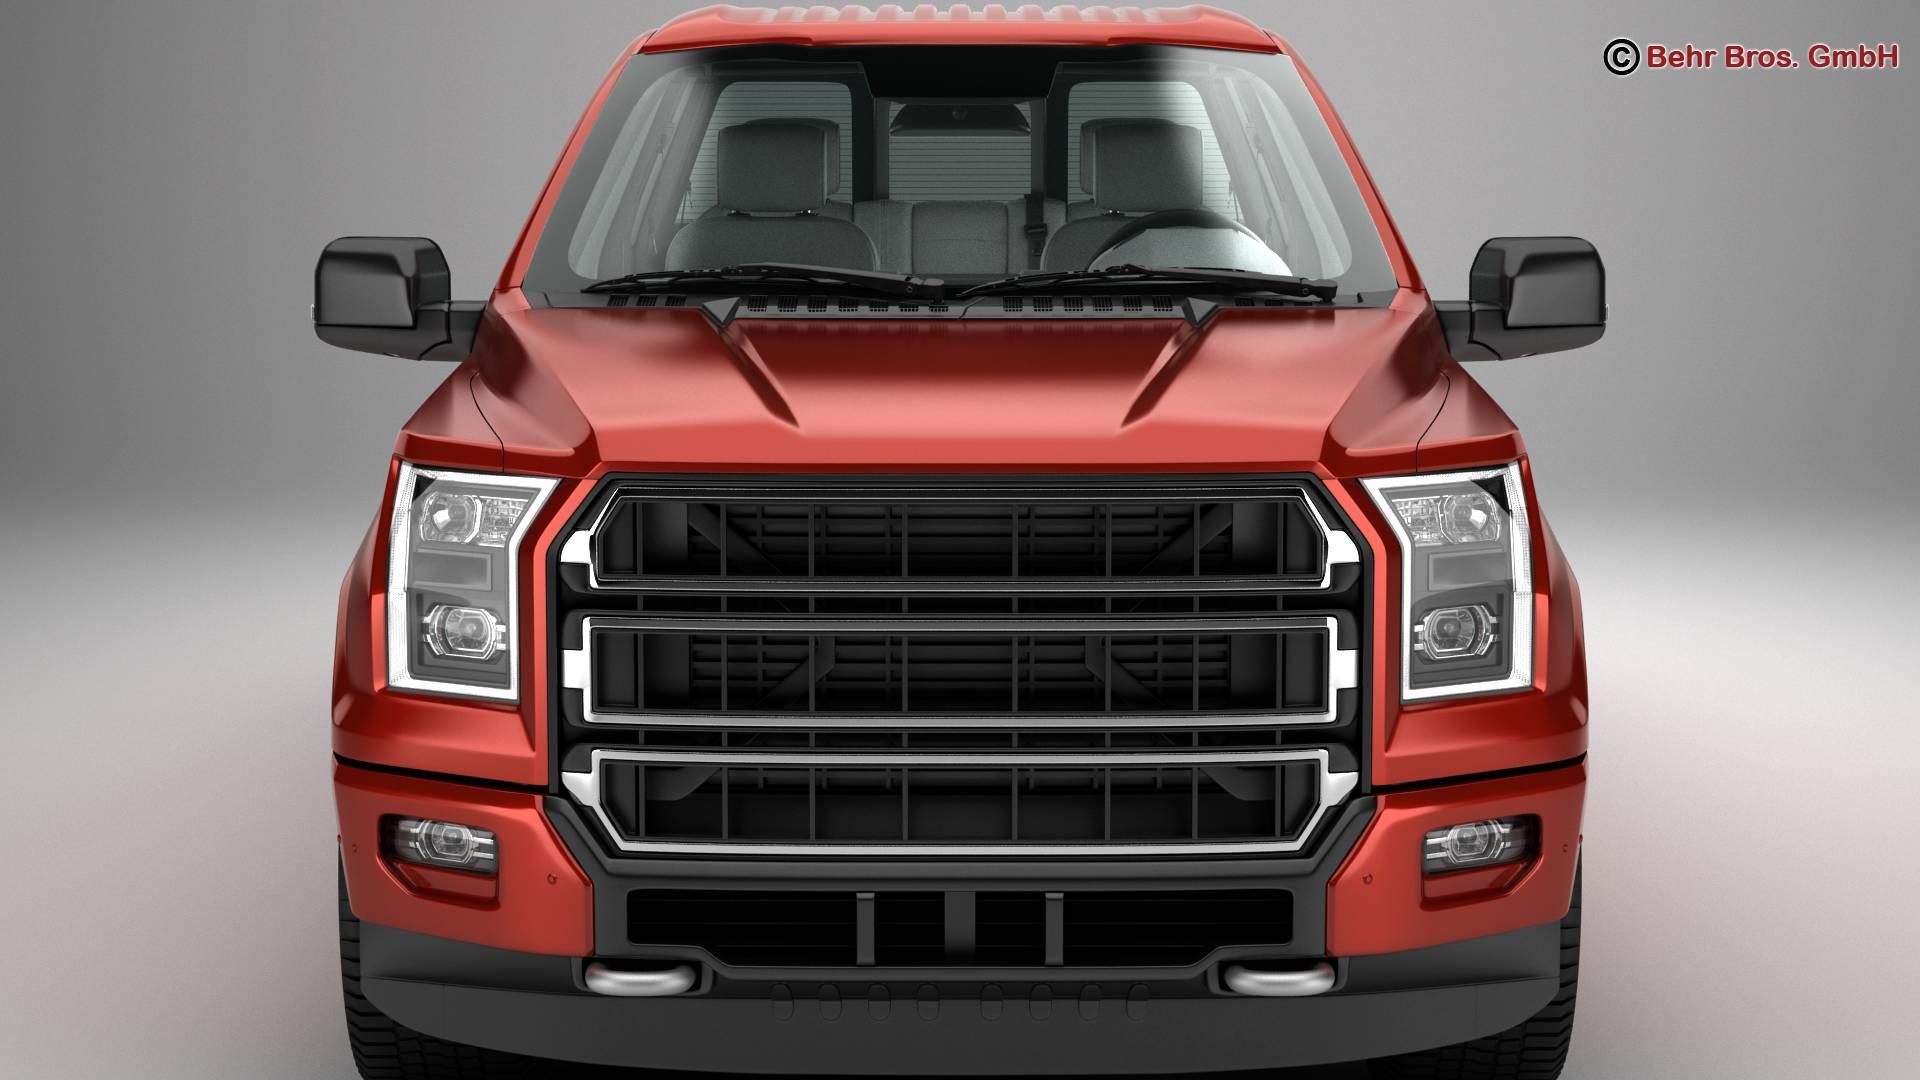 generic pickup 3d model 3ds max fbx c4d lwo ma mb obj 219873